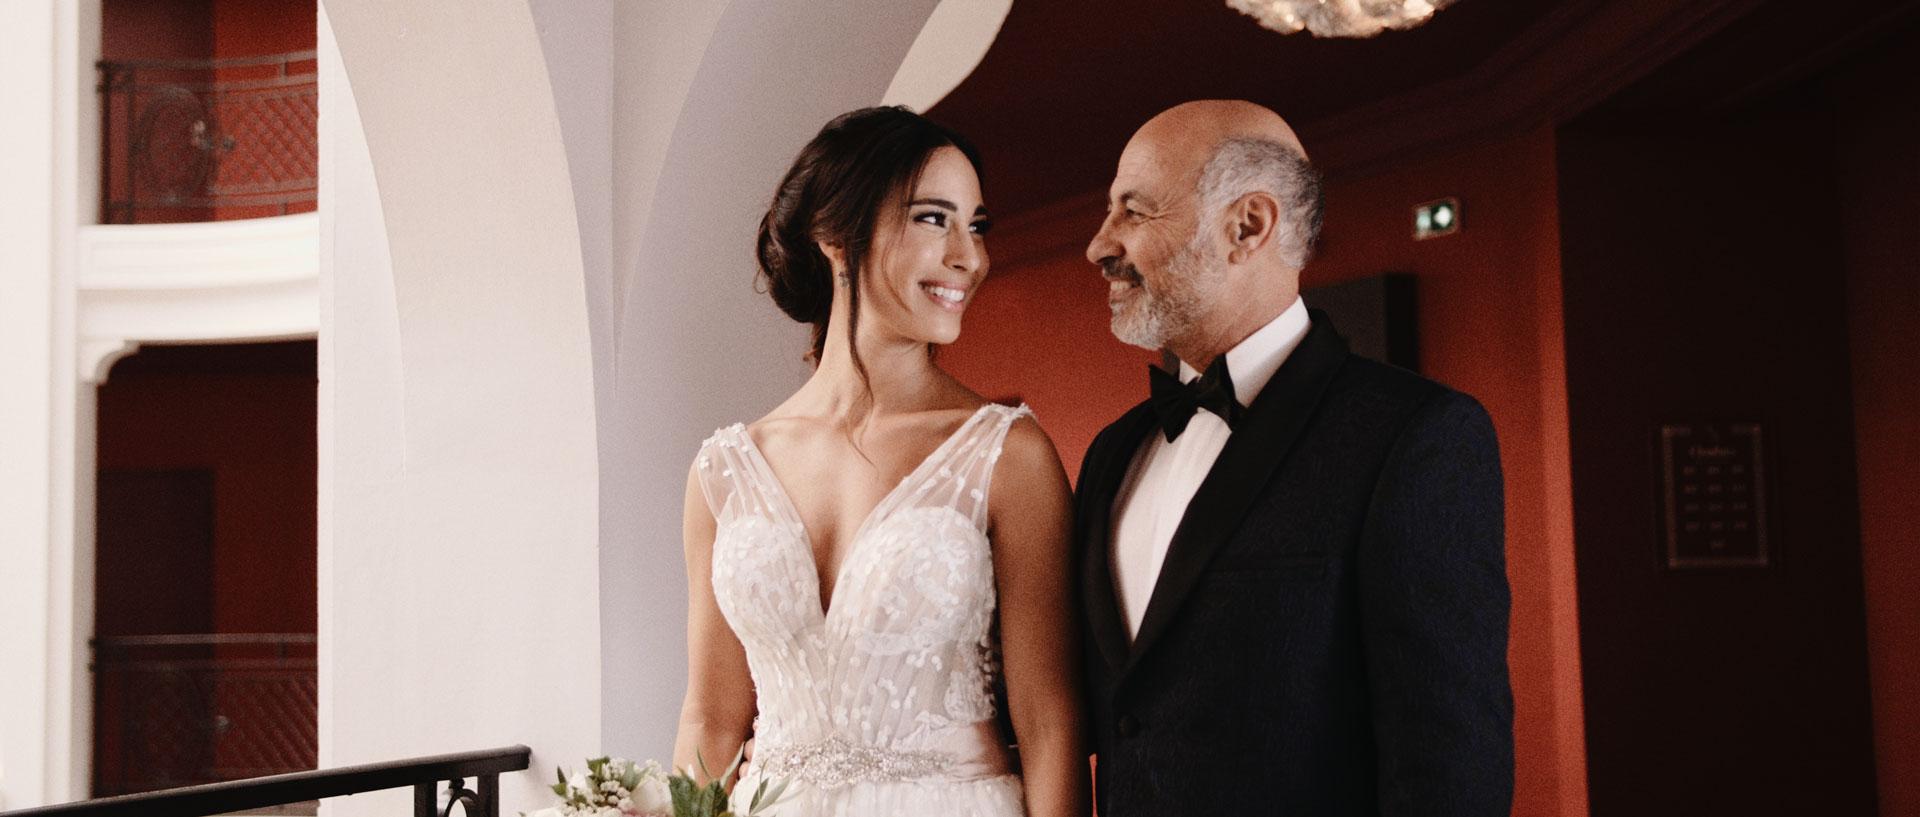 Natasha & Jad Wedding - Casino Biarritz (31).jpg